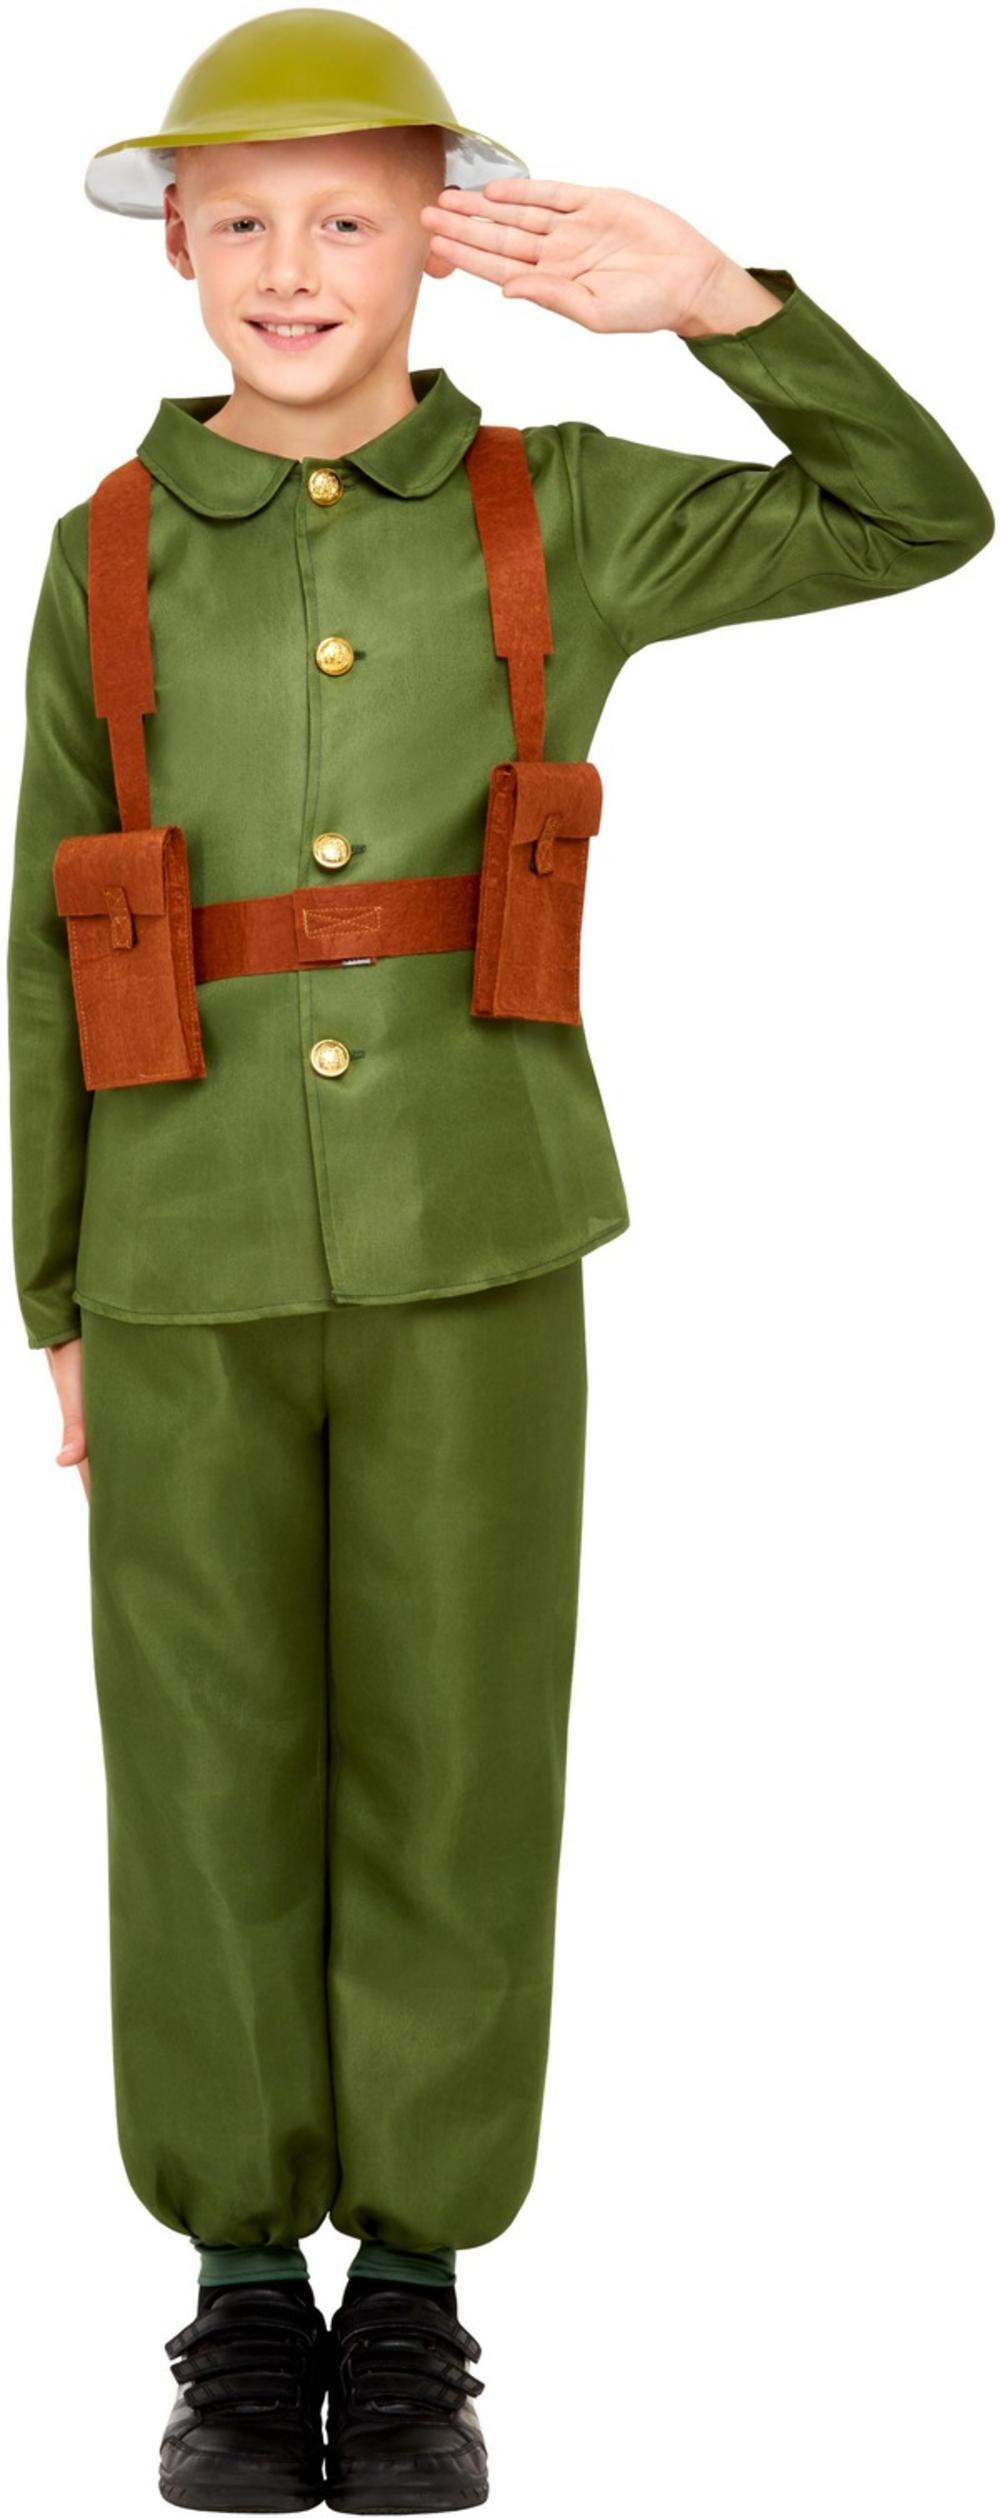 WW1 Soldier Boys Fancy Dress Wartime Army Uniform Kids World Book Day Costume